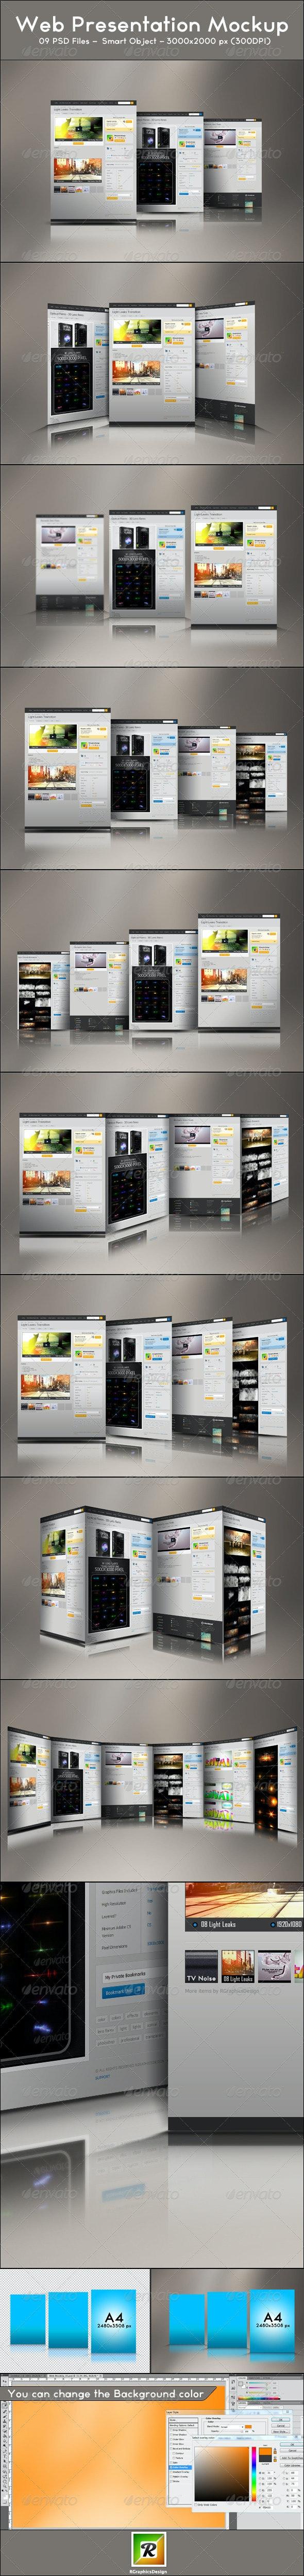 Web Presentation Mockup - Website Displays